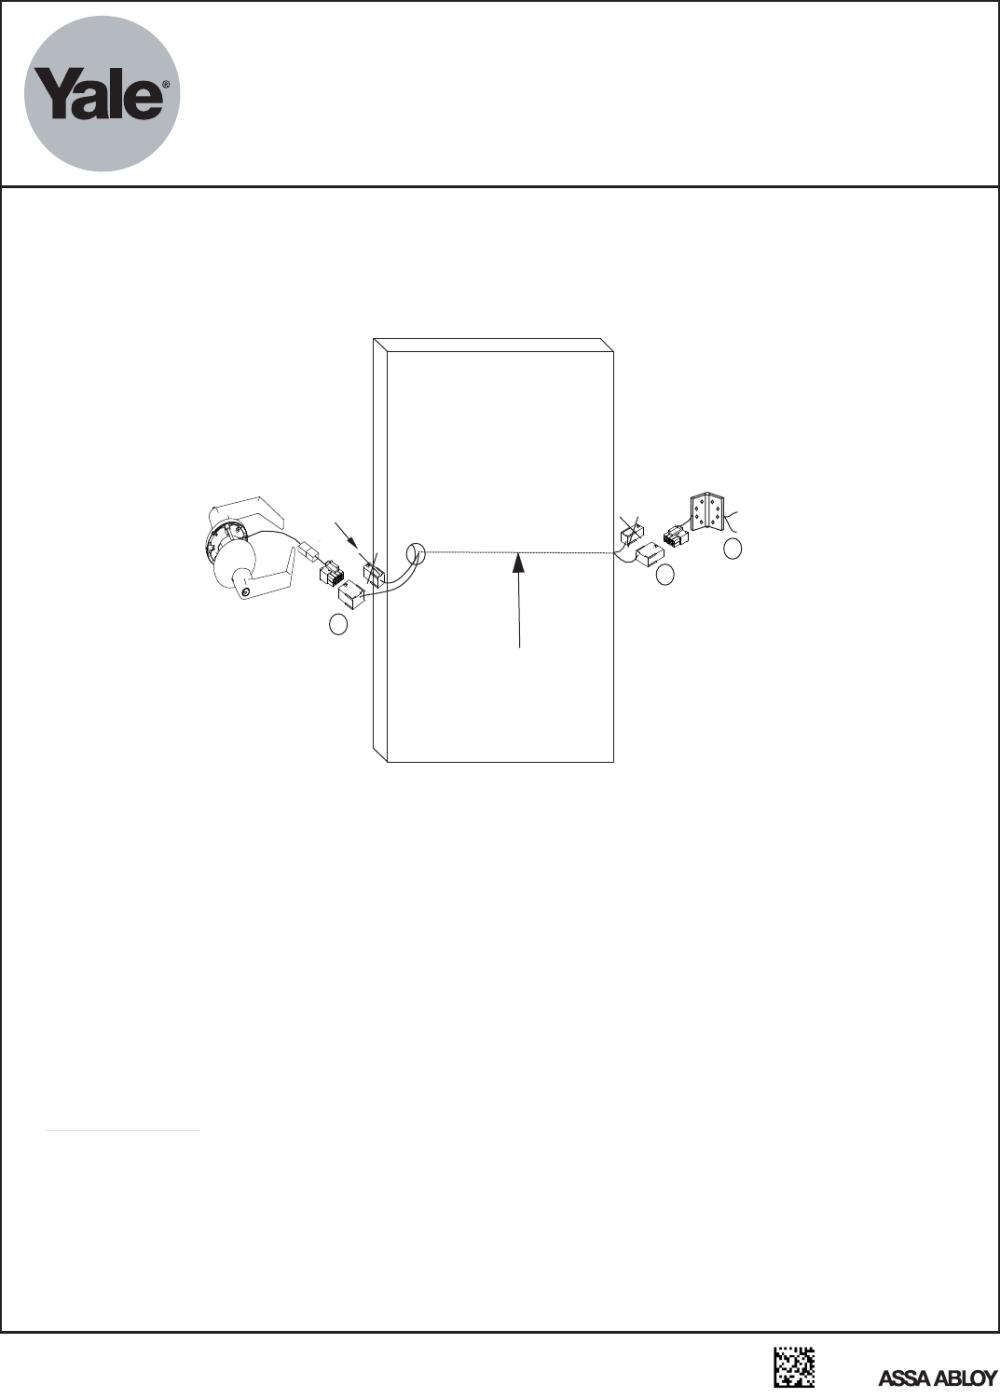 medium resolution of yale 80 9470 0012 000 02 13 electrified wiring instructions 5390ln 5391ln and 4790ln 4791ln 00002 135300ln 4700lnwiring